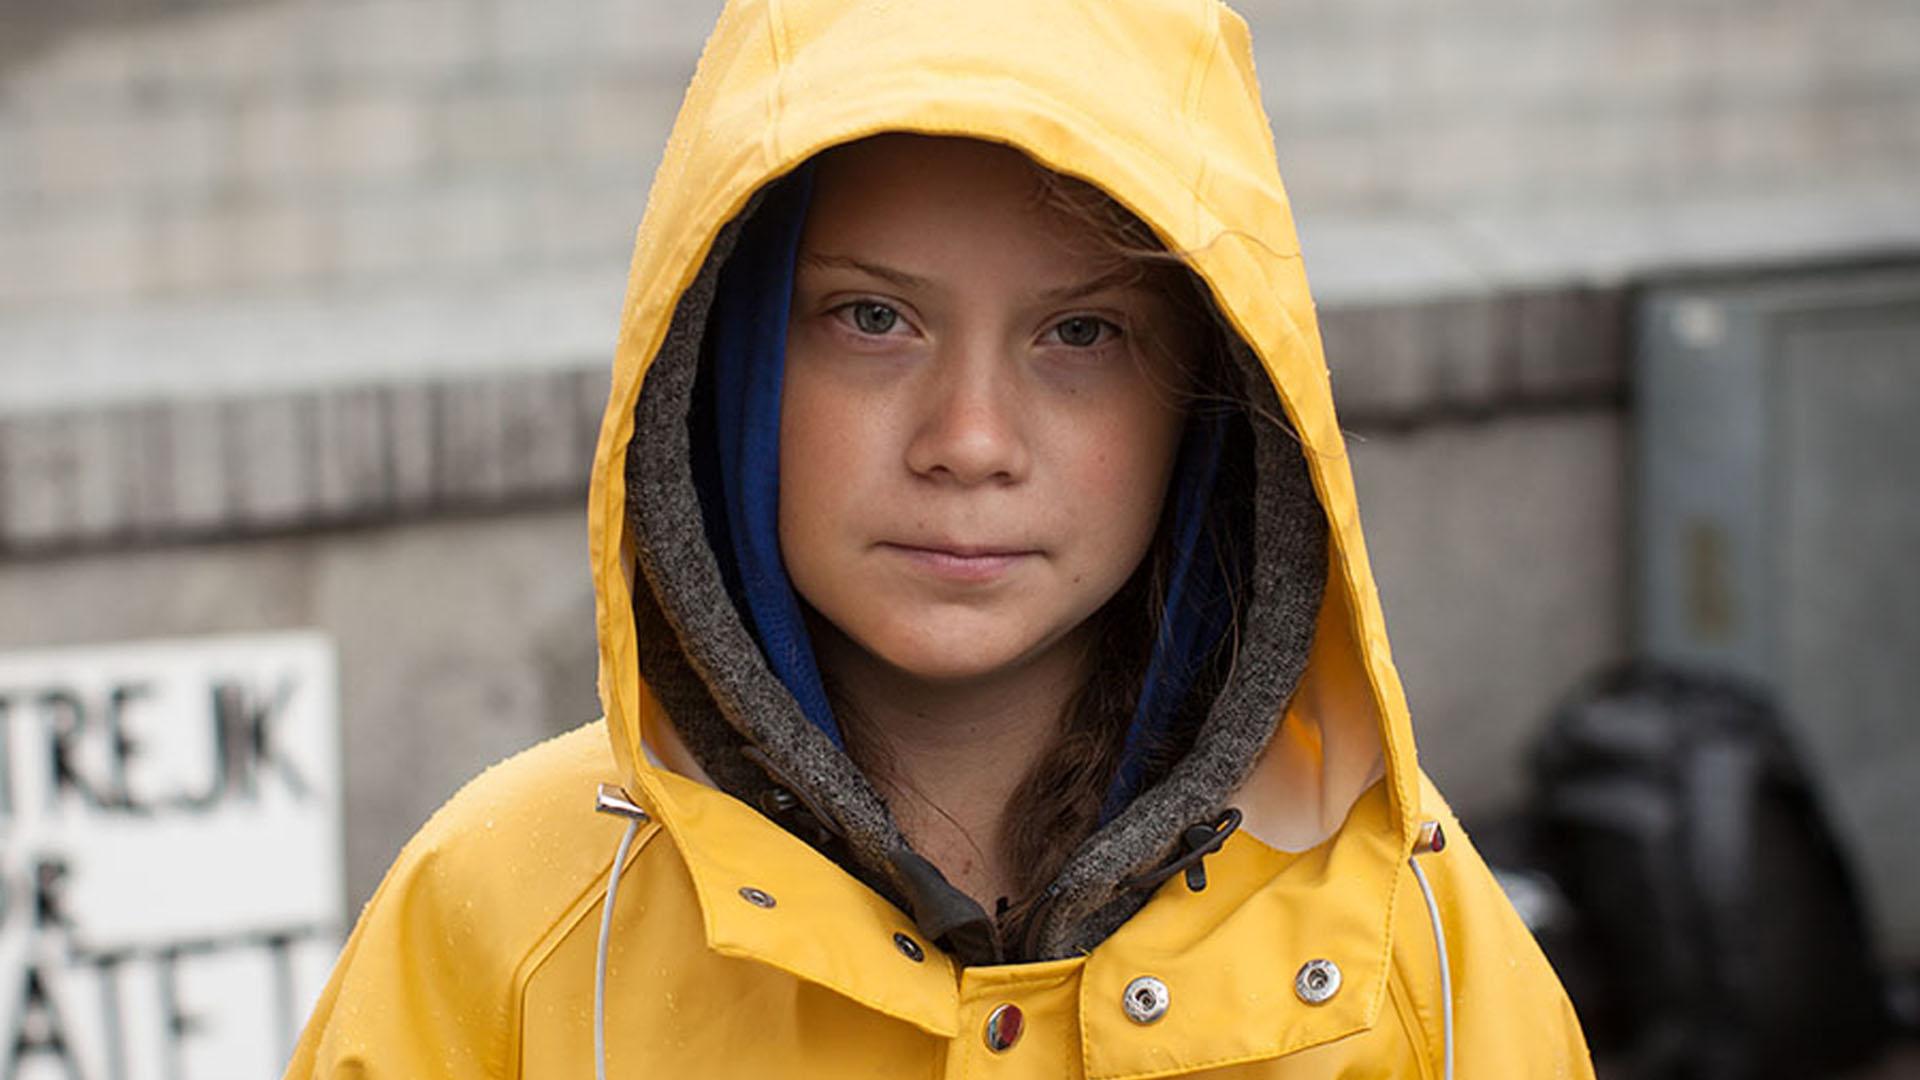 Greta Thunbergi lugu